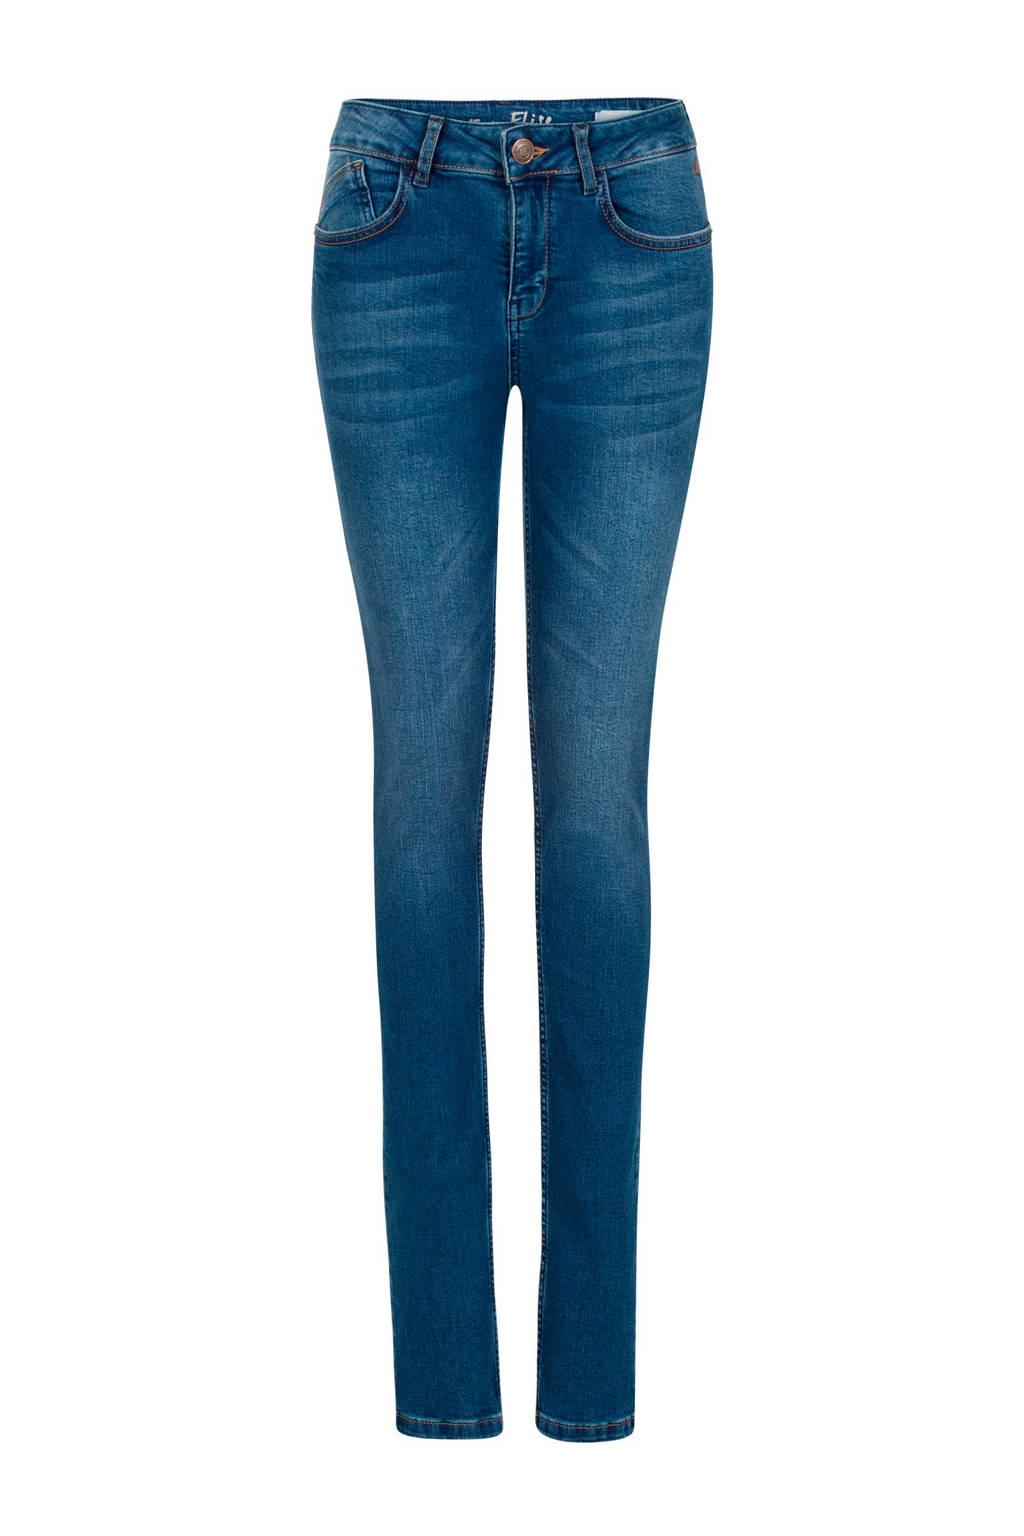 Miss Etam Regulier skinny jeans Elise 36 inch stonewashed, Lang